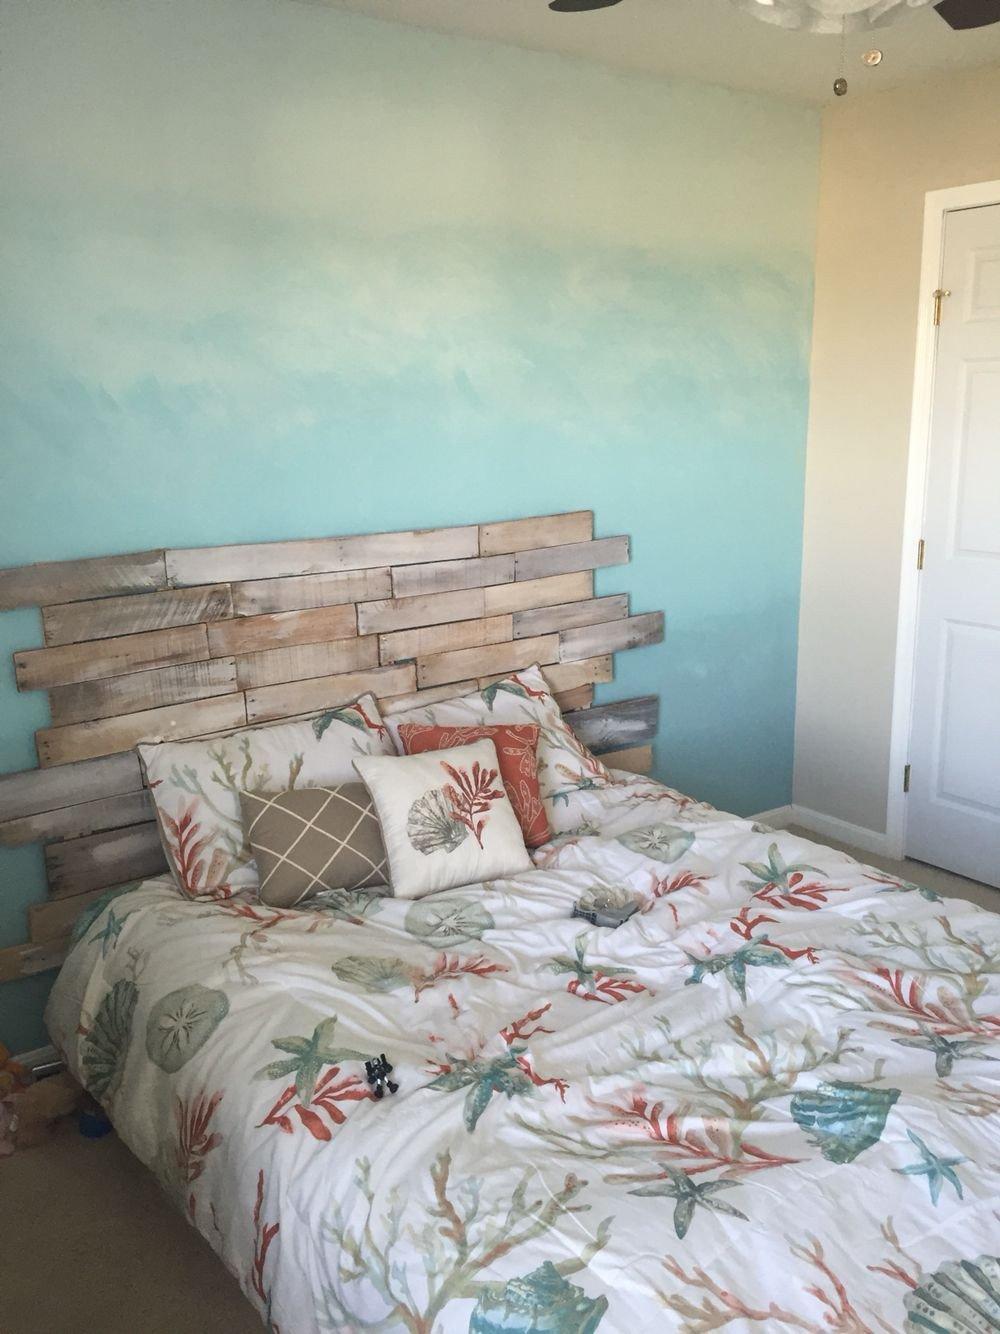 Beach themed Kids Bedroom Best Of Ombré Ocean Wall Pallet Headboard for A Beach themed Room